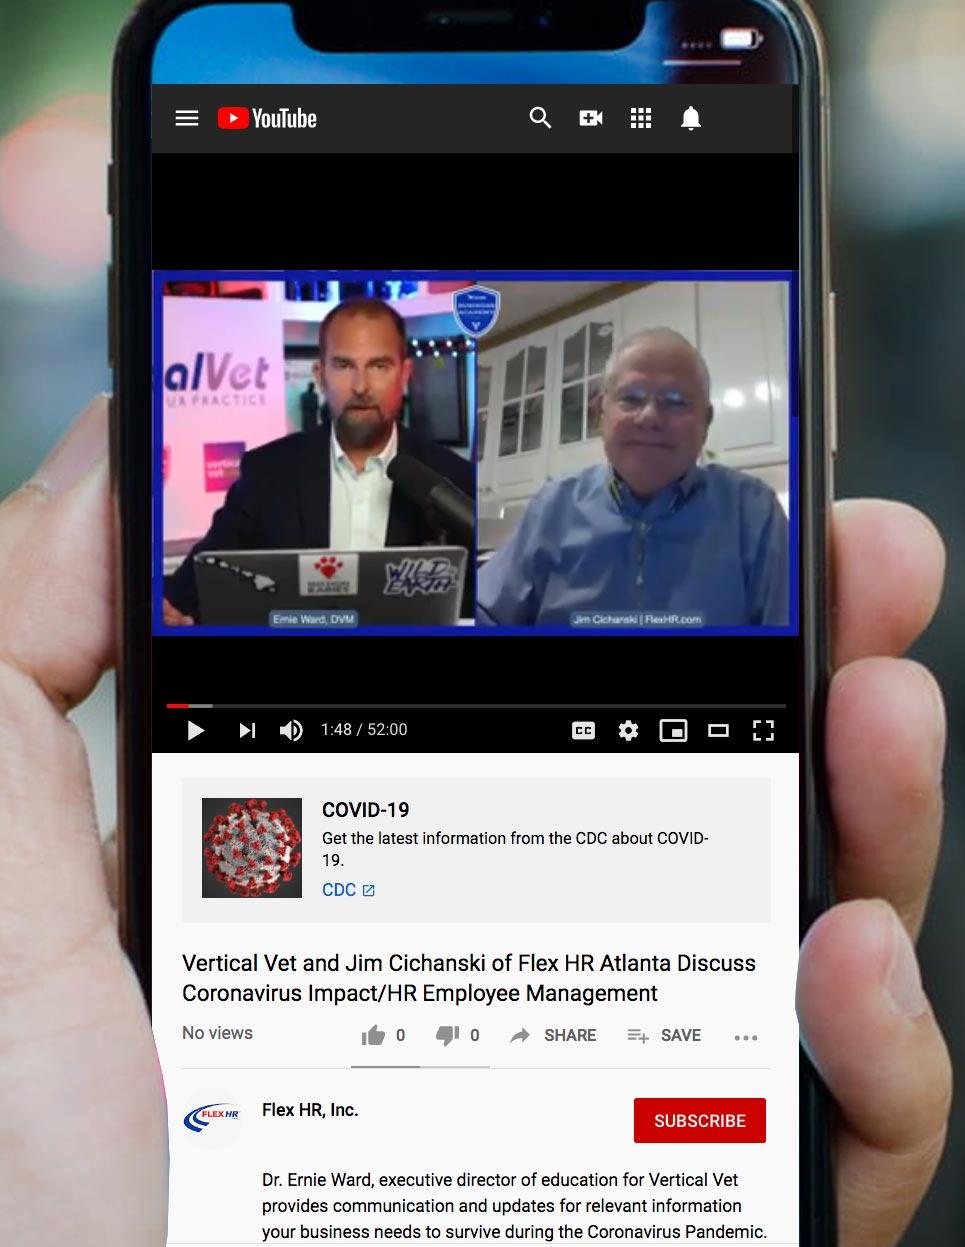 Vertical vet and Jim Cichanski discuss the coronavirus